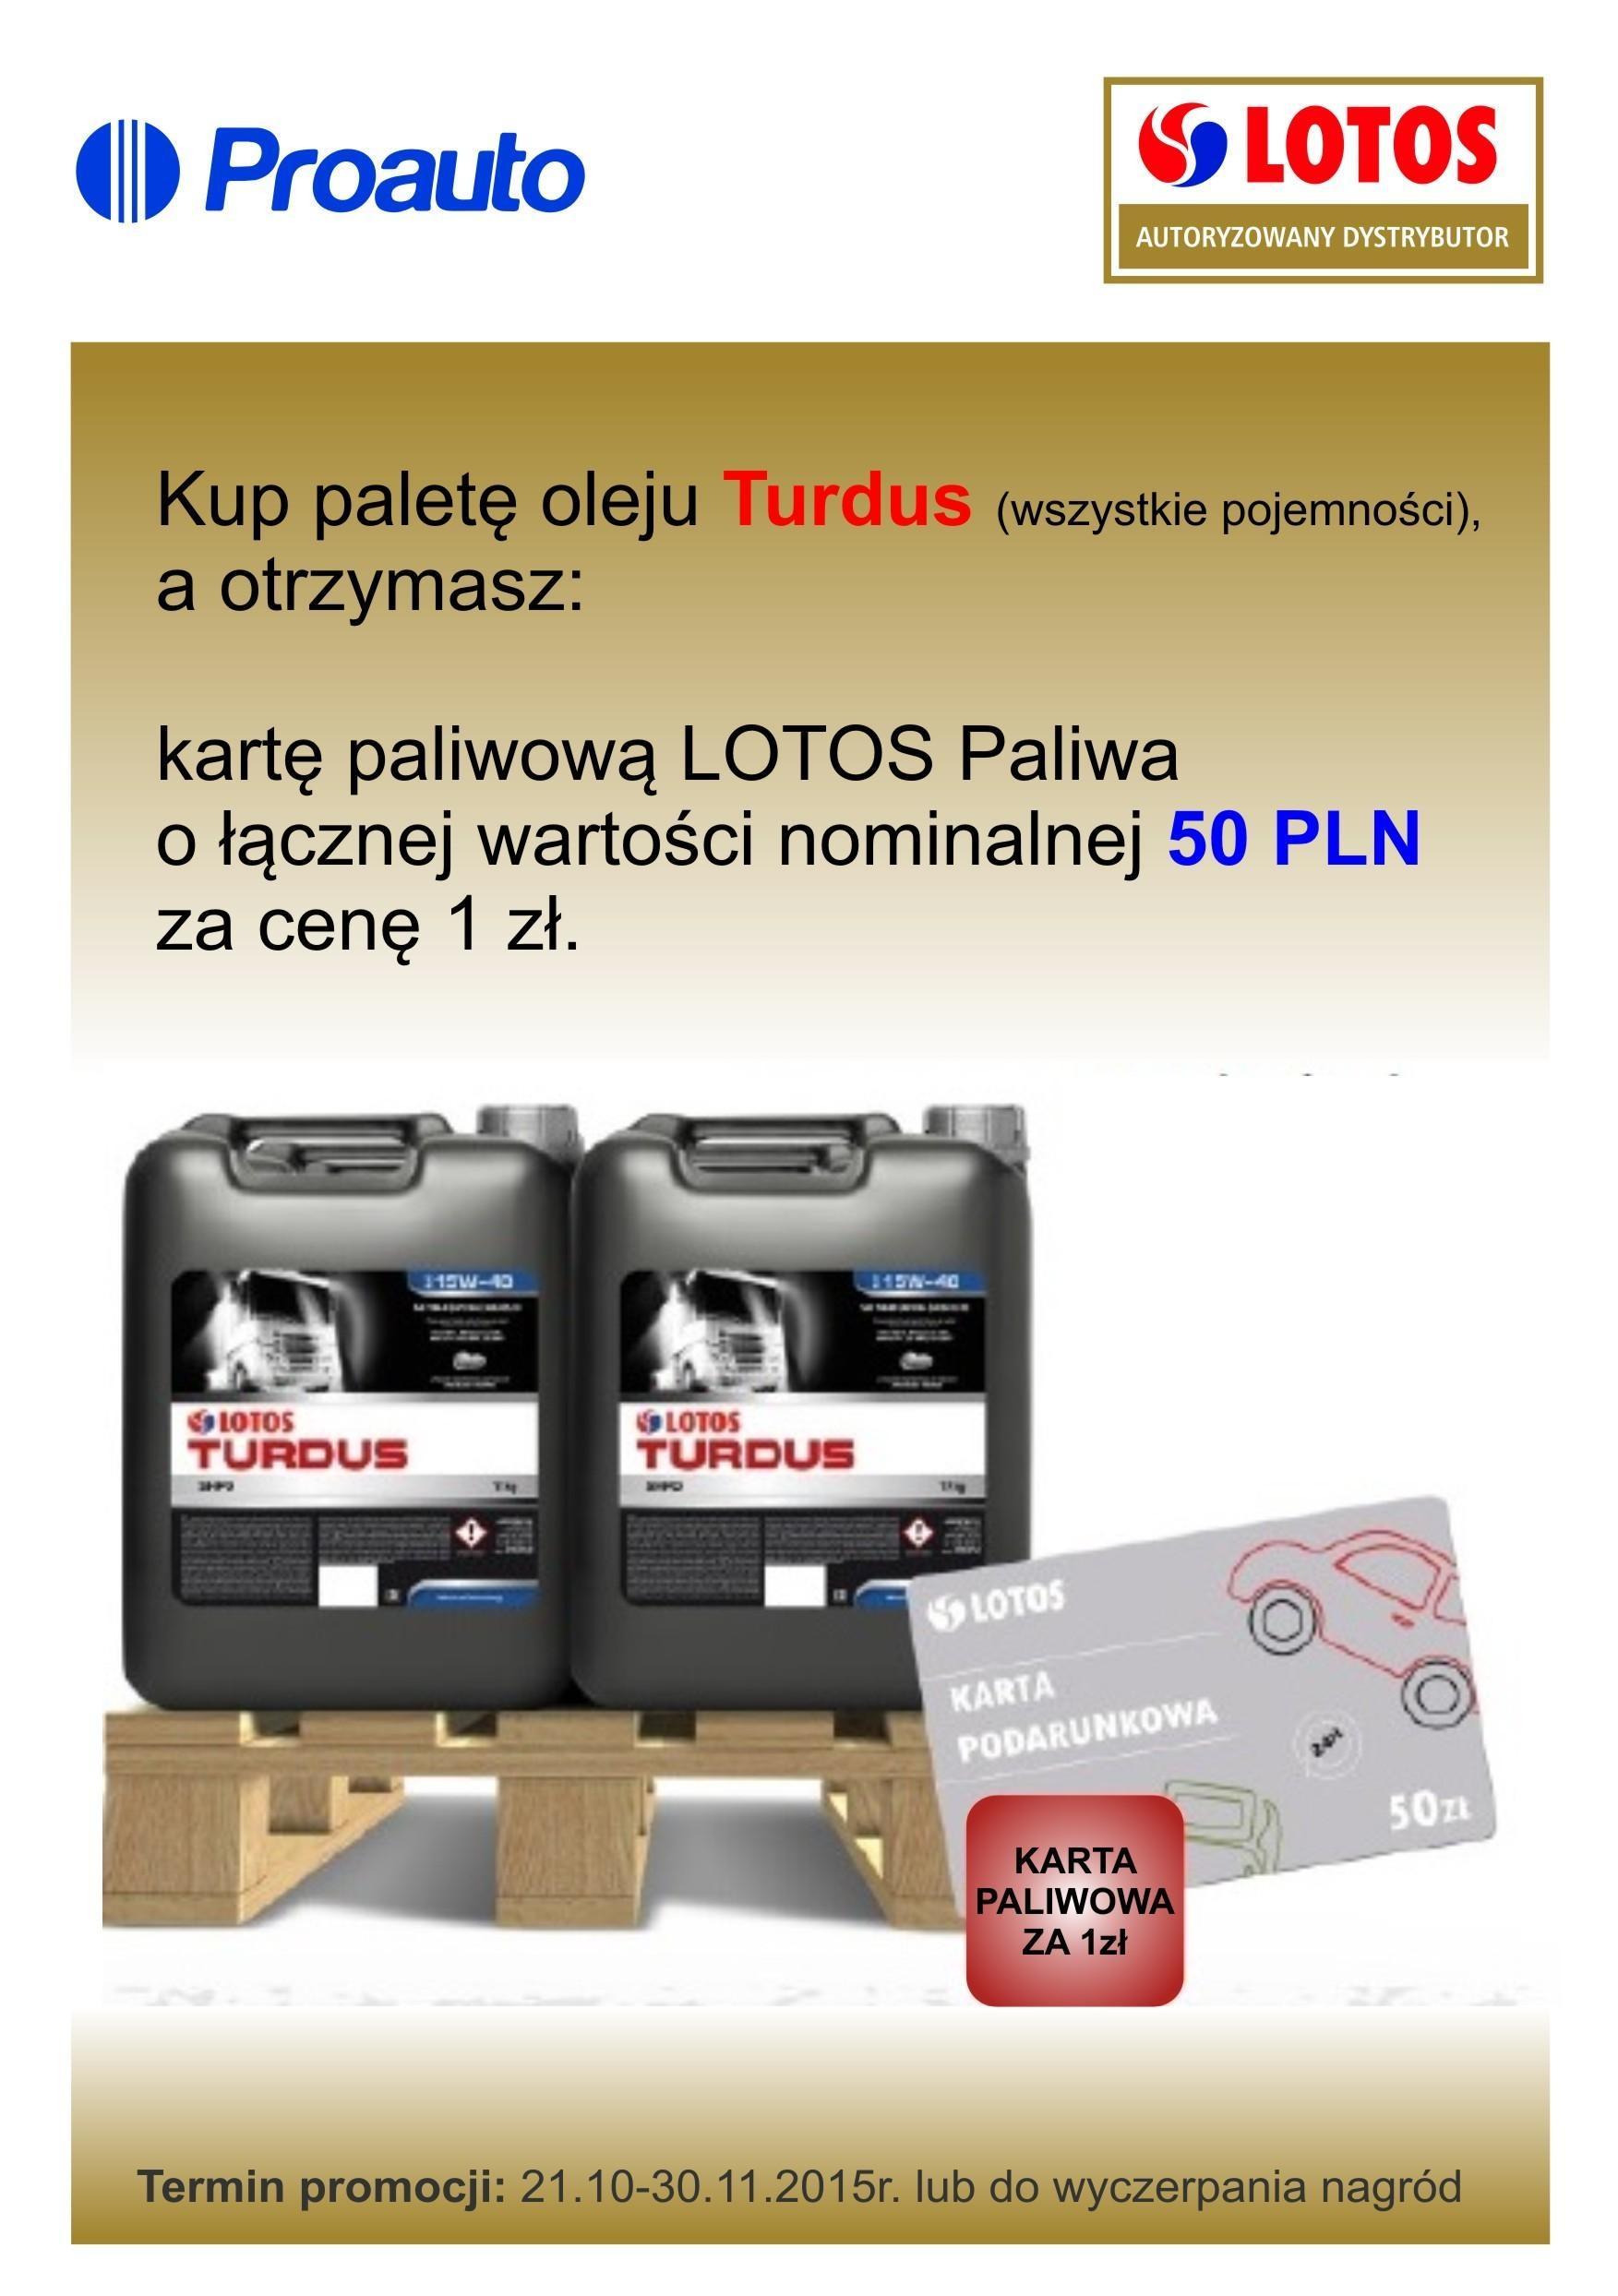 promocja lotos turdus - Promocja Lotos Turdus